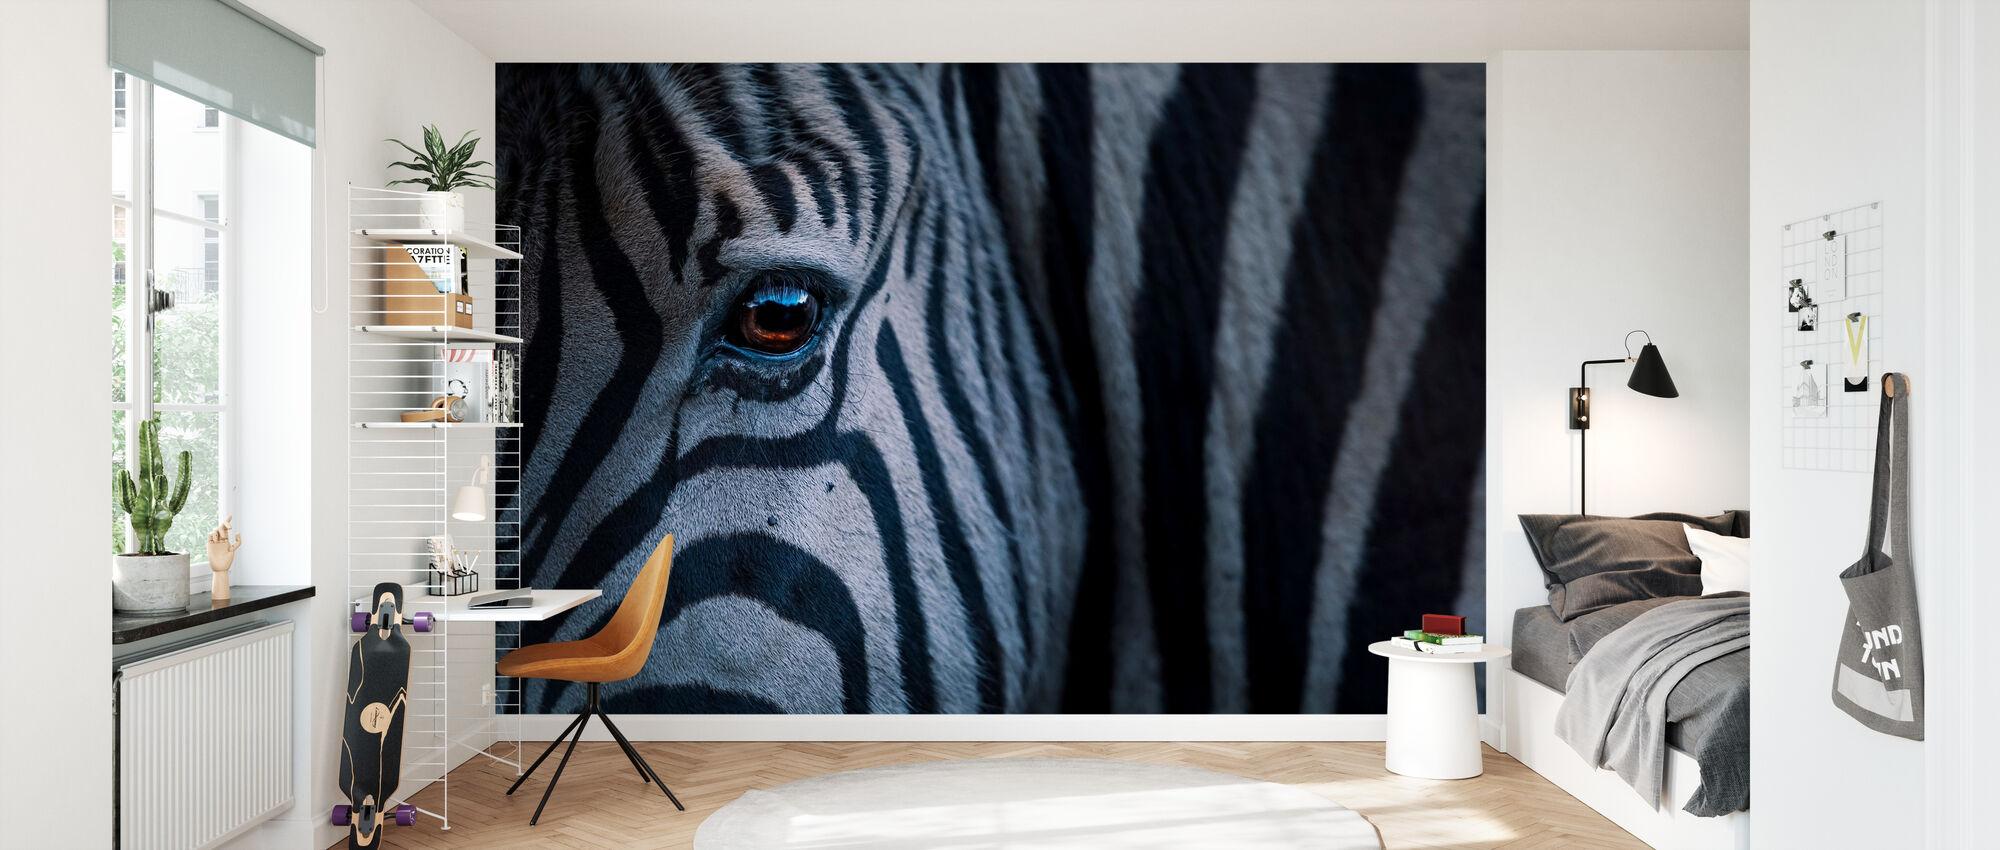 Plains Zebra Close Up - Wallpaper - Kids Room